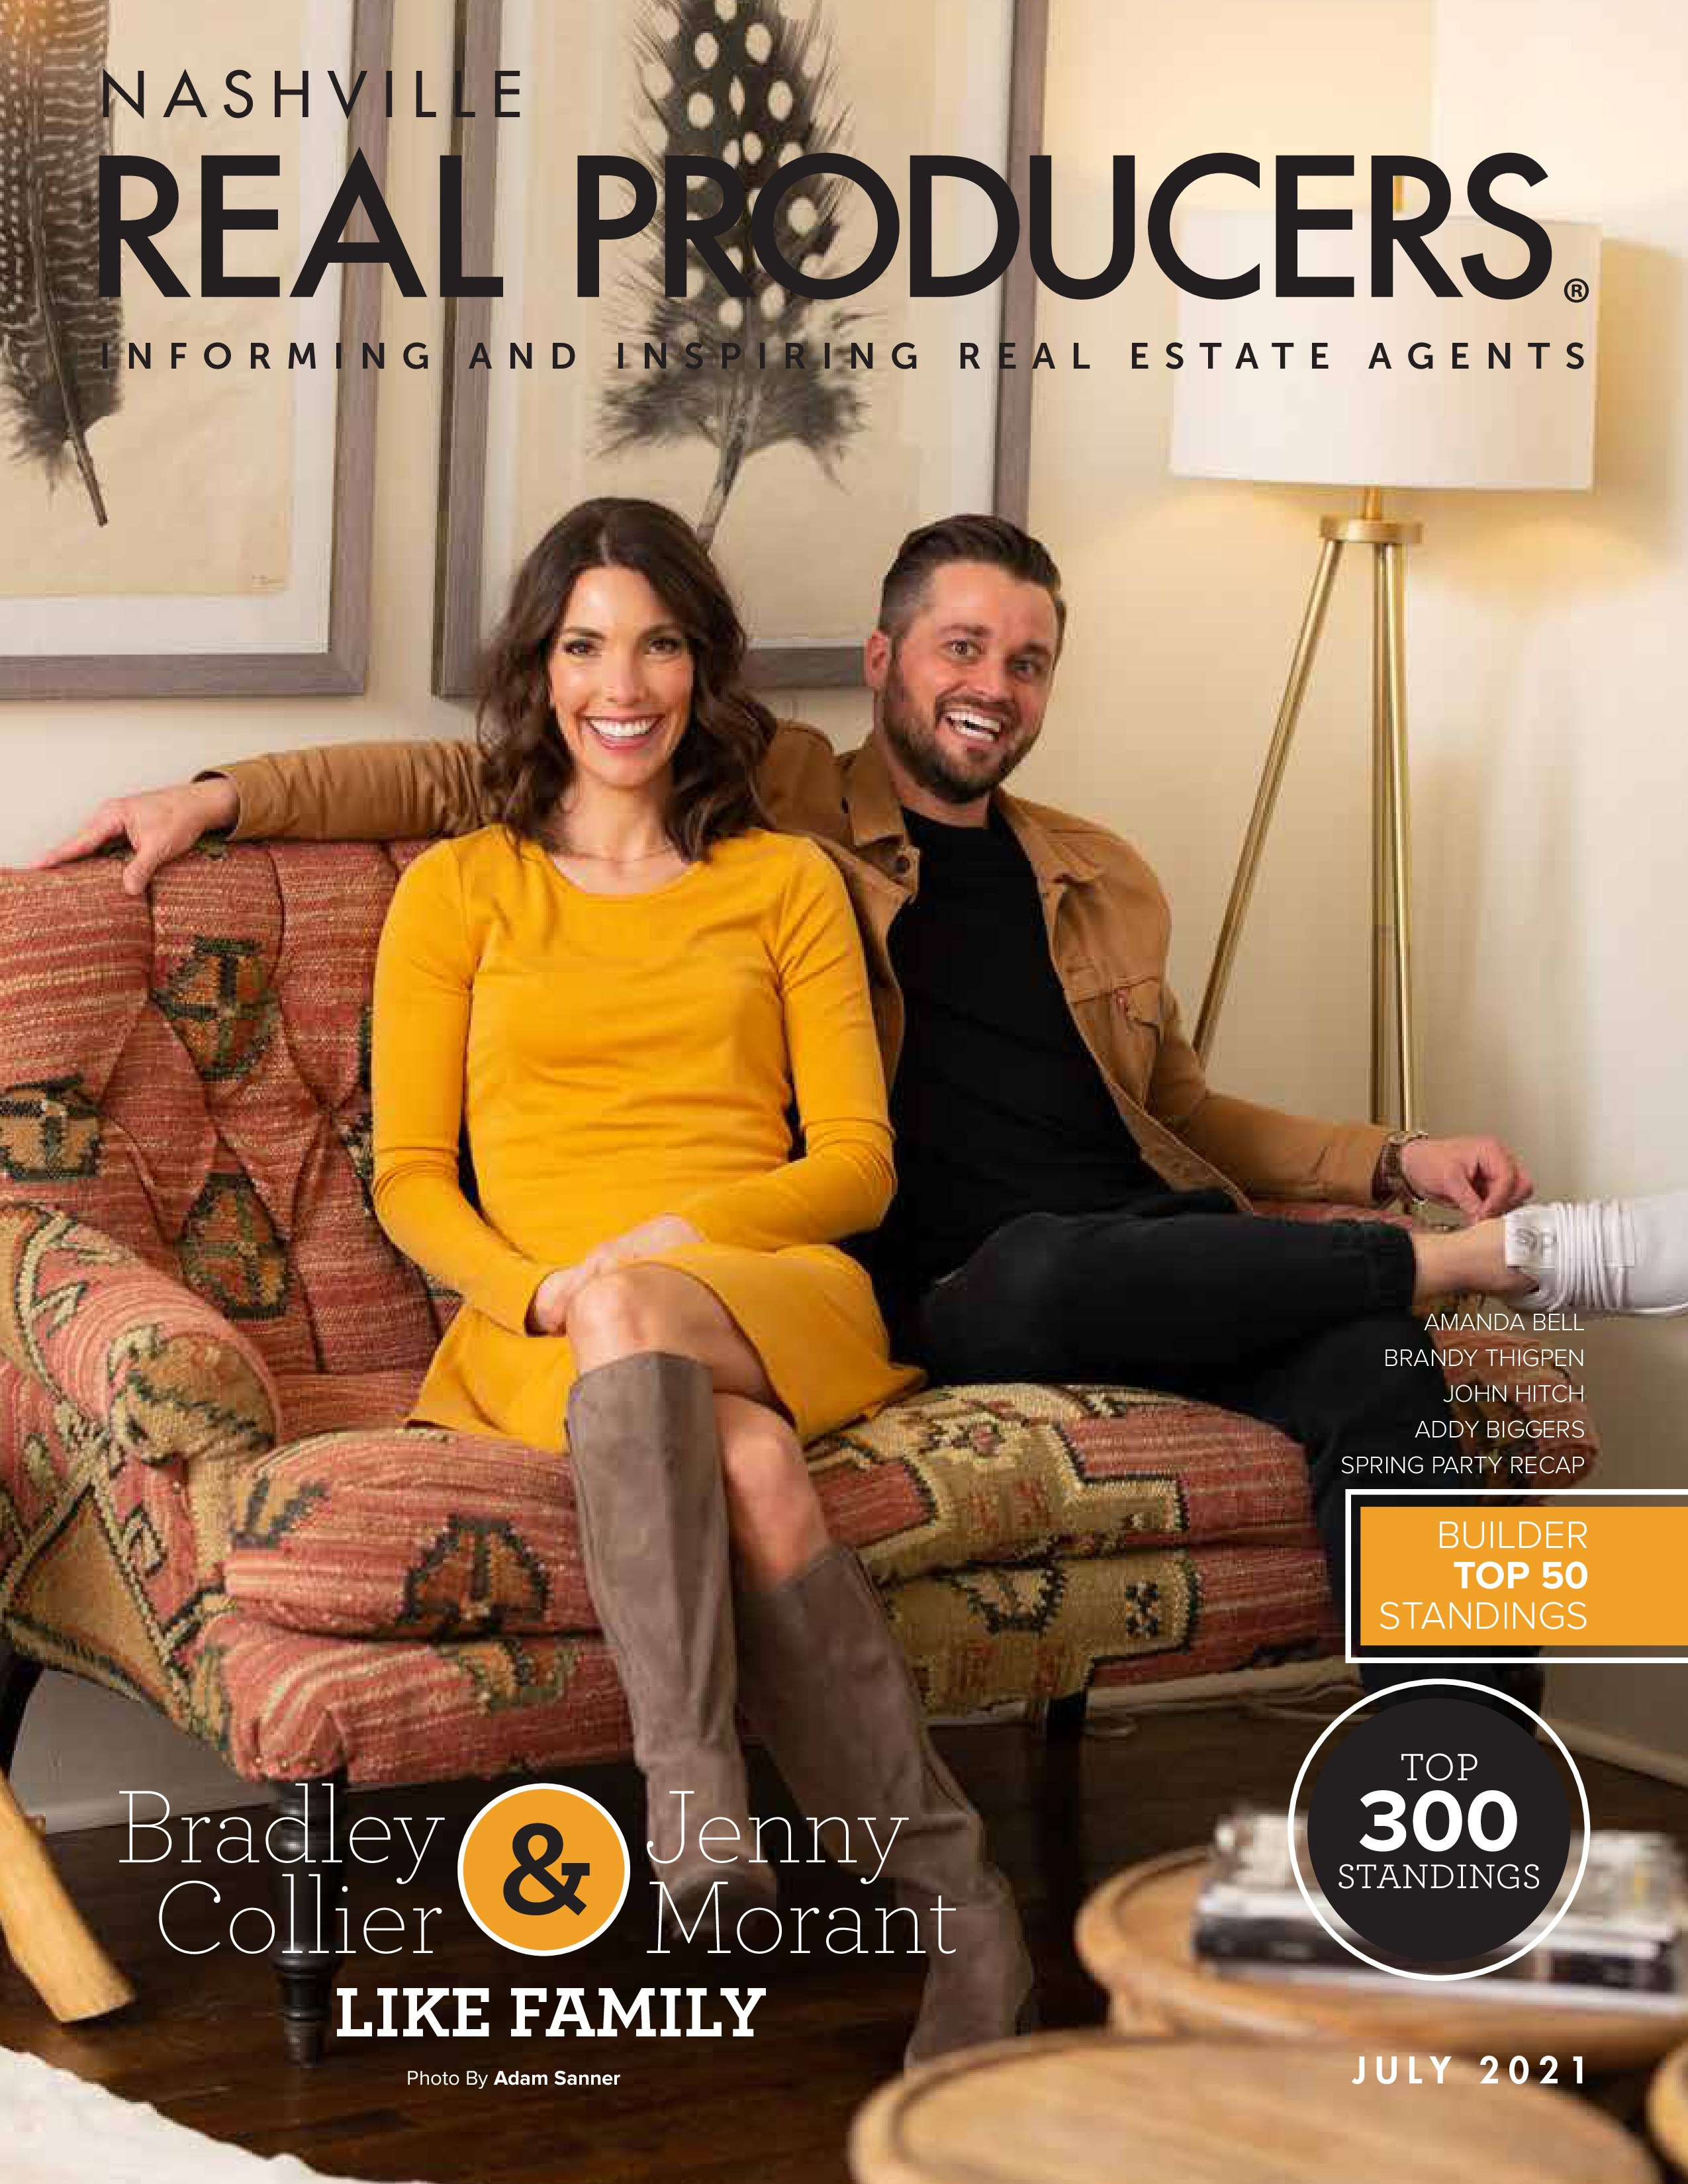 Nashville Real Producers 2021-07-01